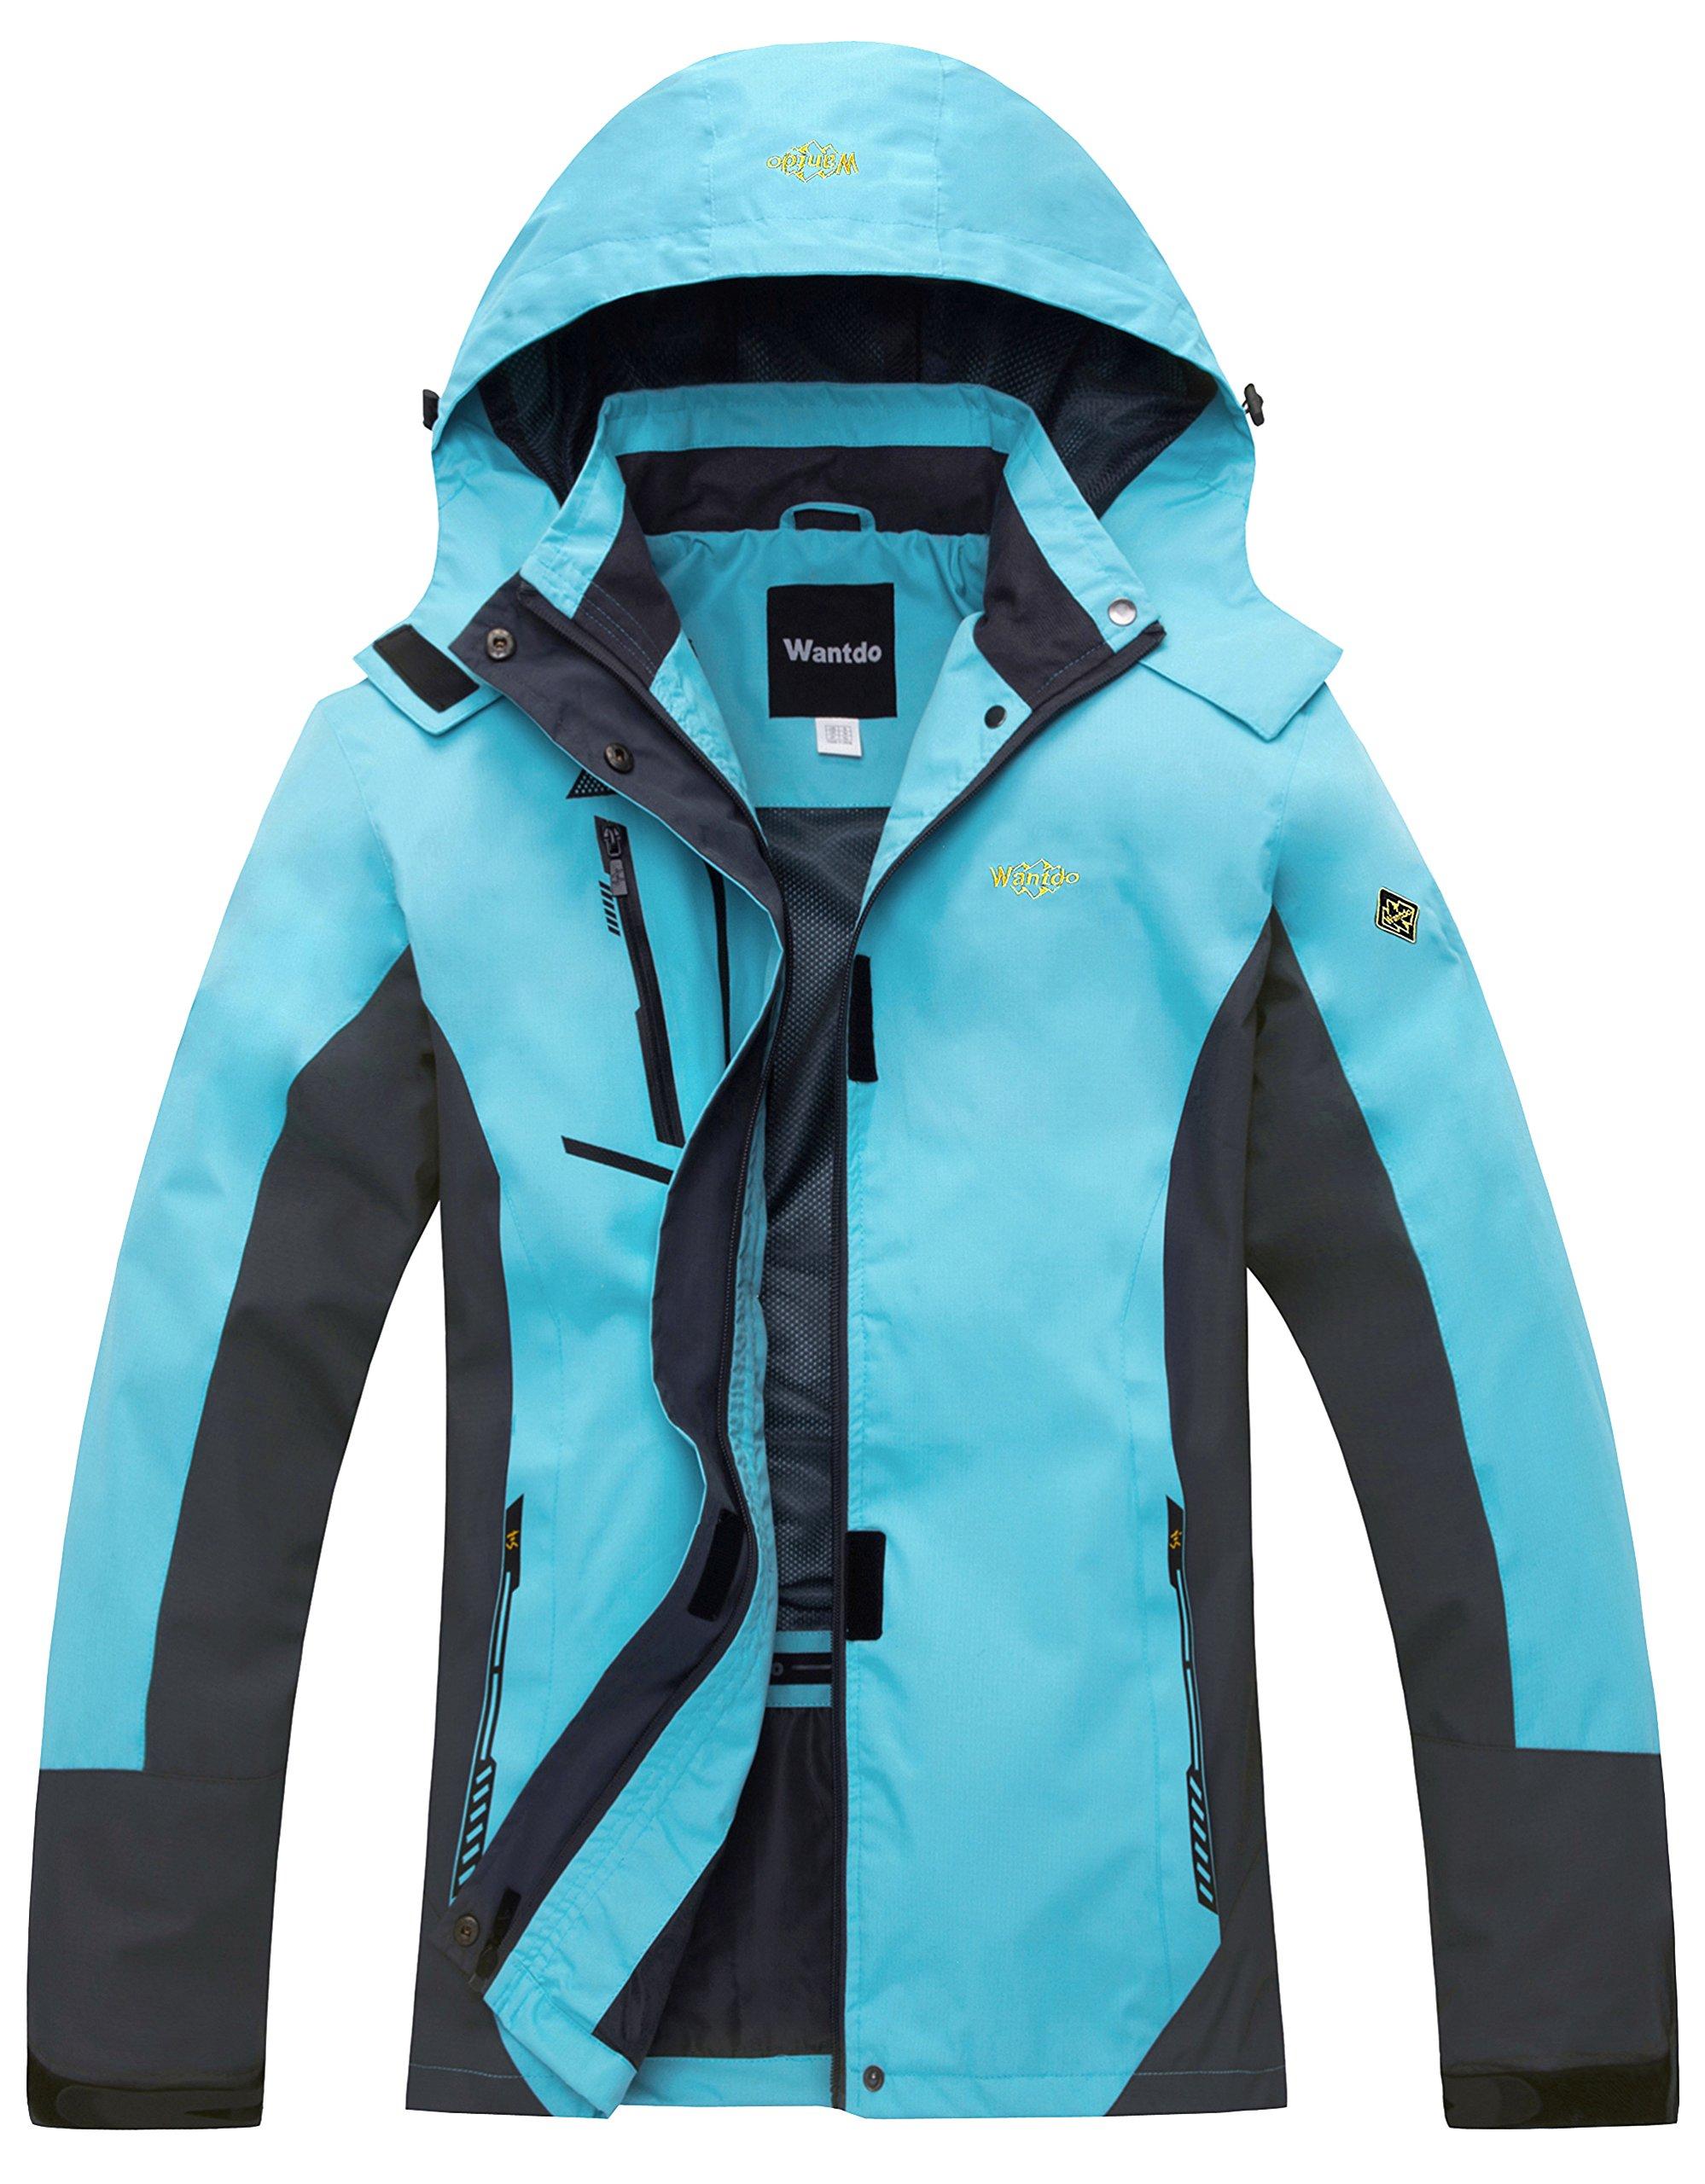 Wantdo Women's Windbreaker Raincoat Breathable Softshell Hiking Jacket Blue US S